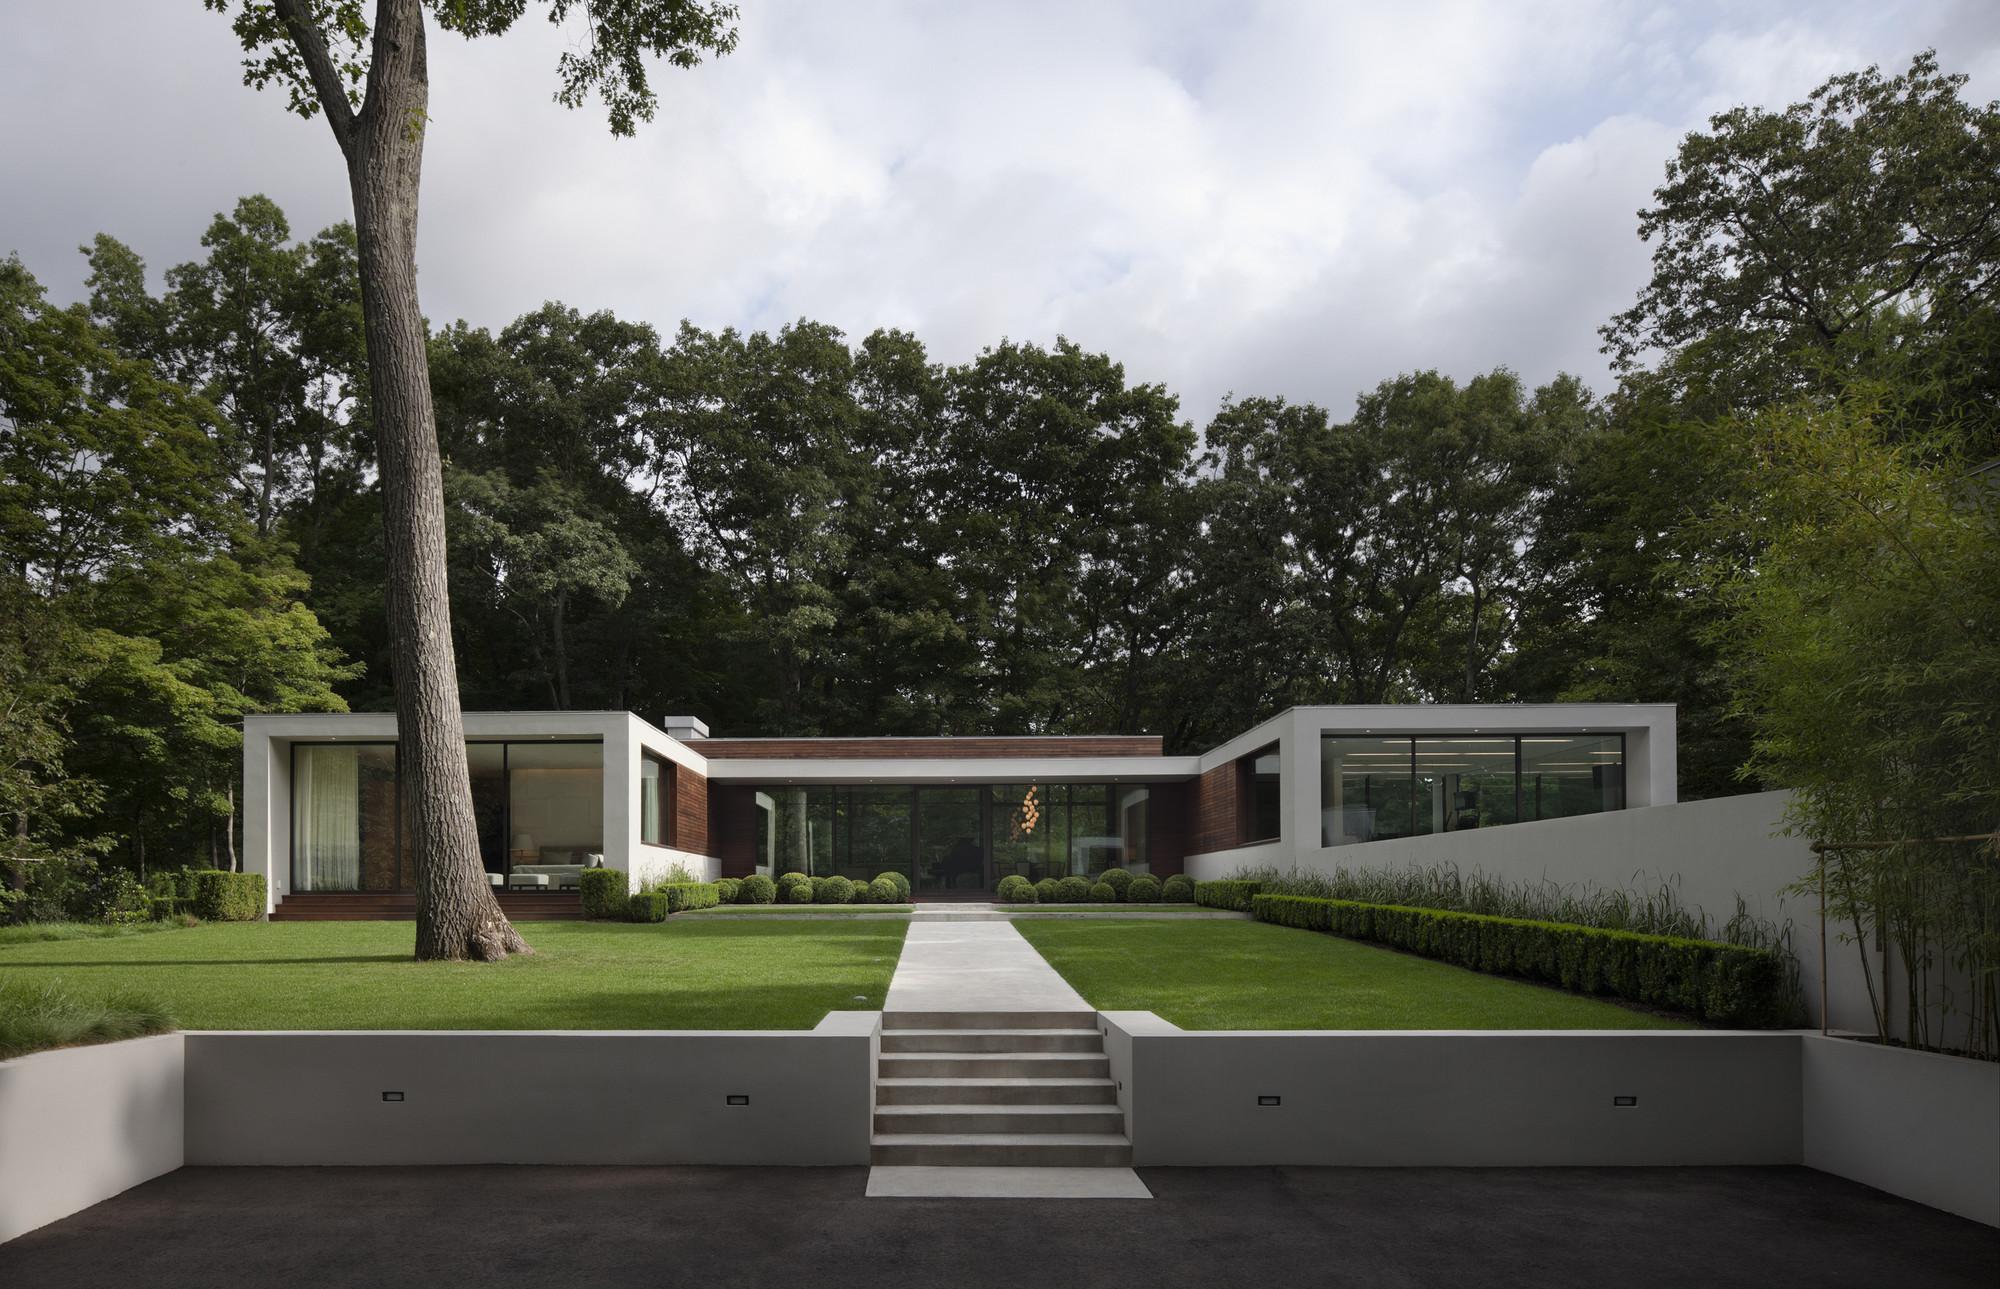 New Canaan Residence / Specht Harpman,  Elizabeth Felicella